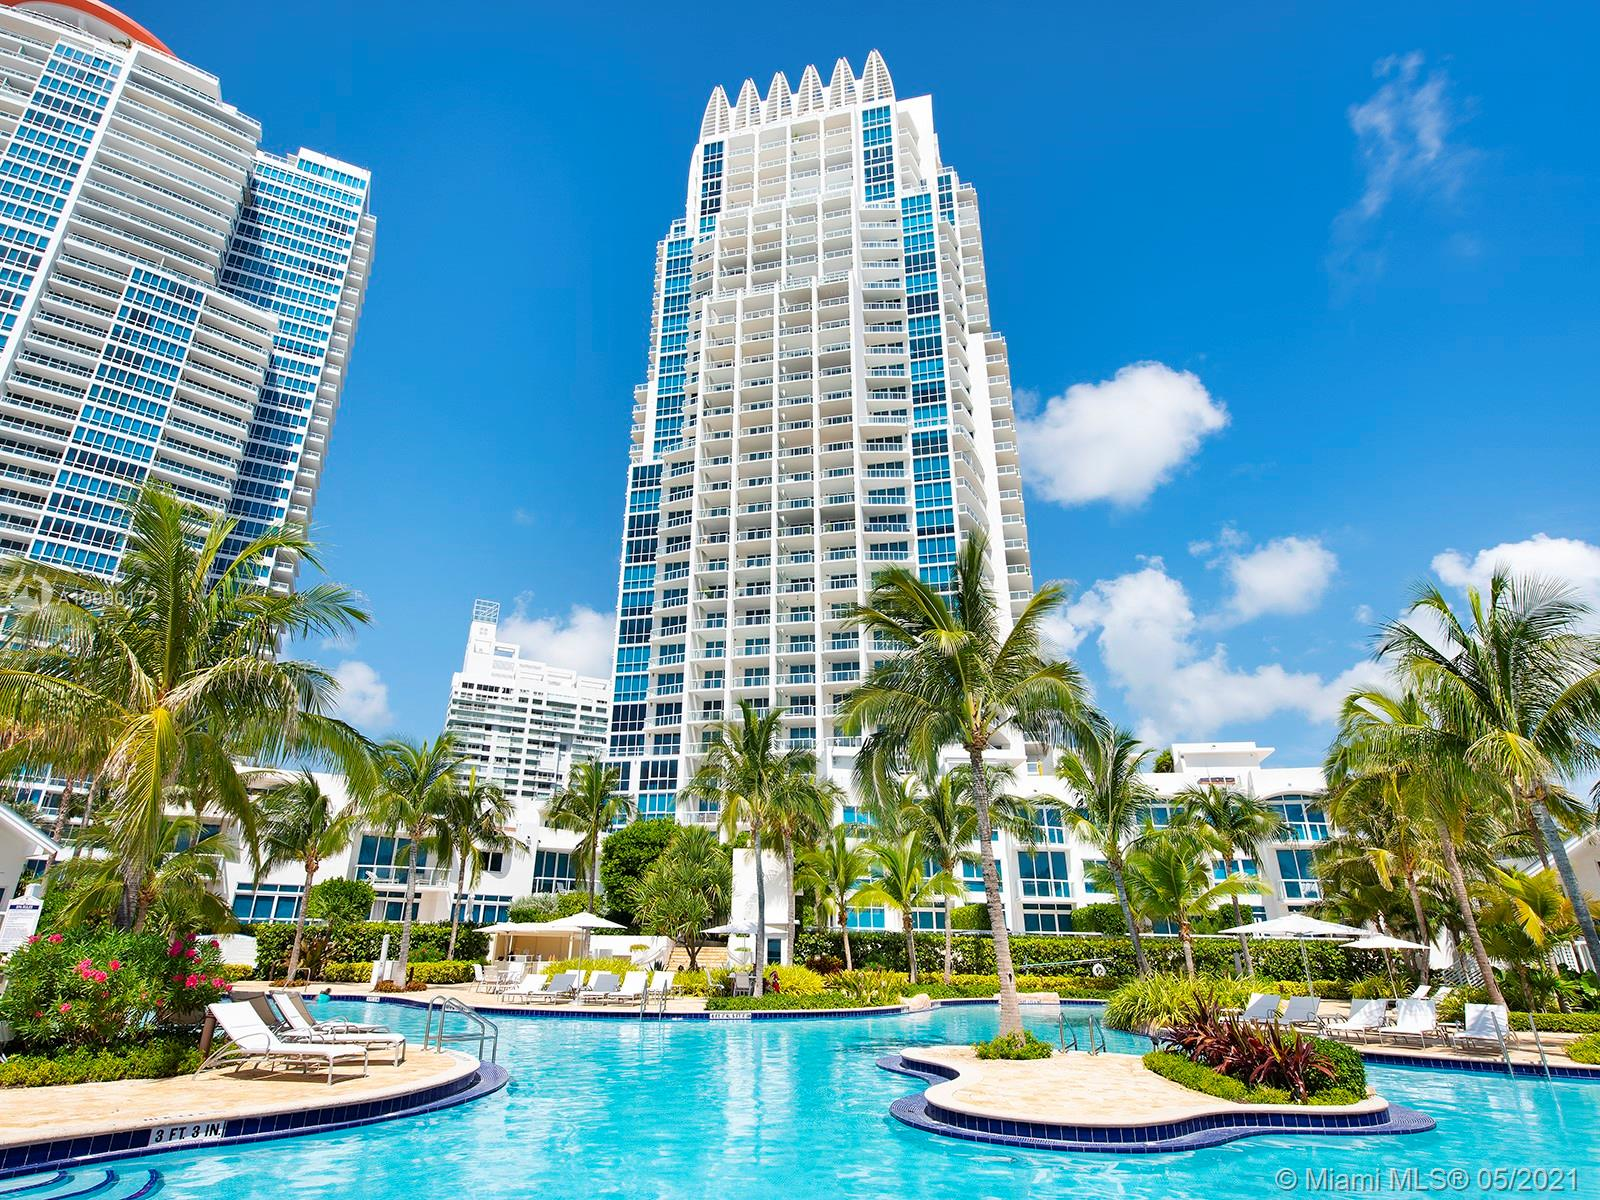 Continuum North #602 - 50 S Pointe Dr #602, Miami Beach, FL 33139